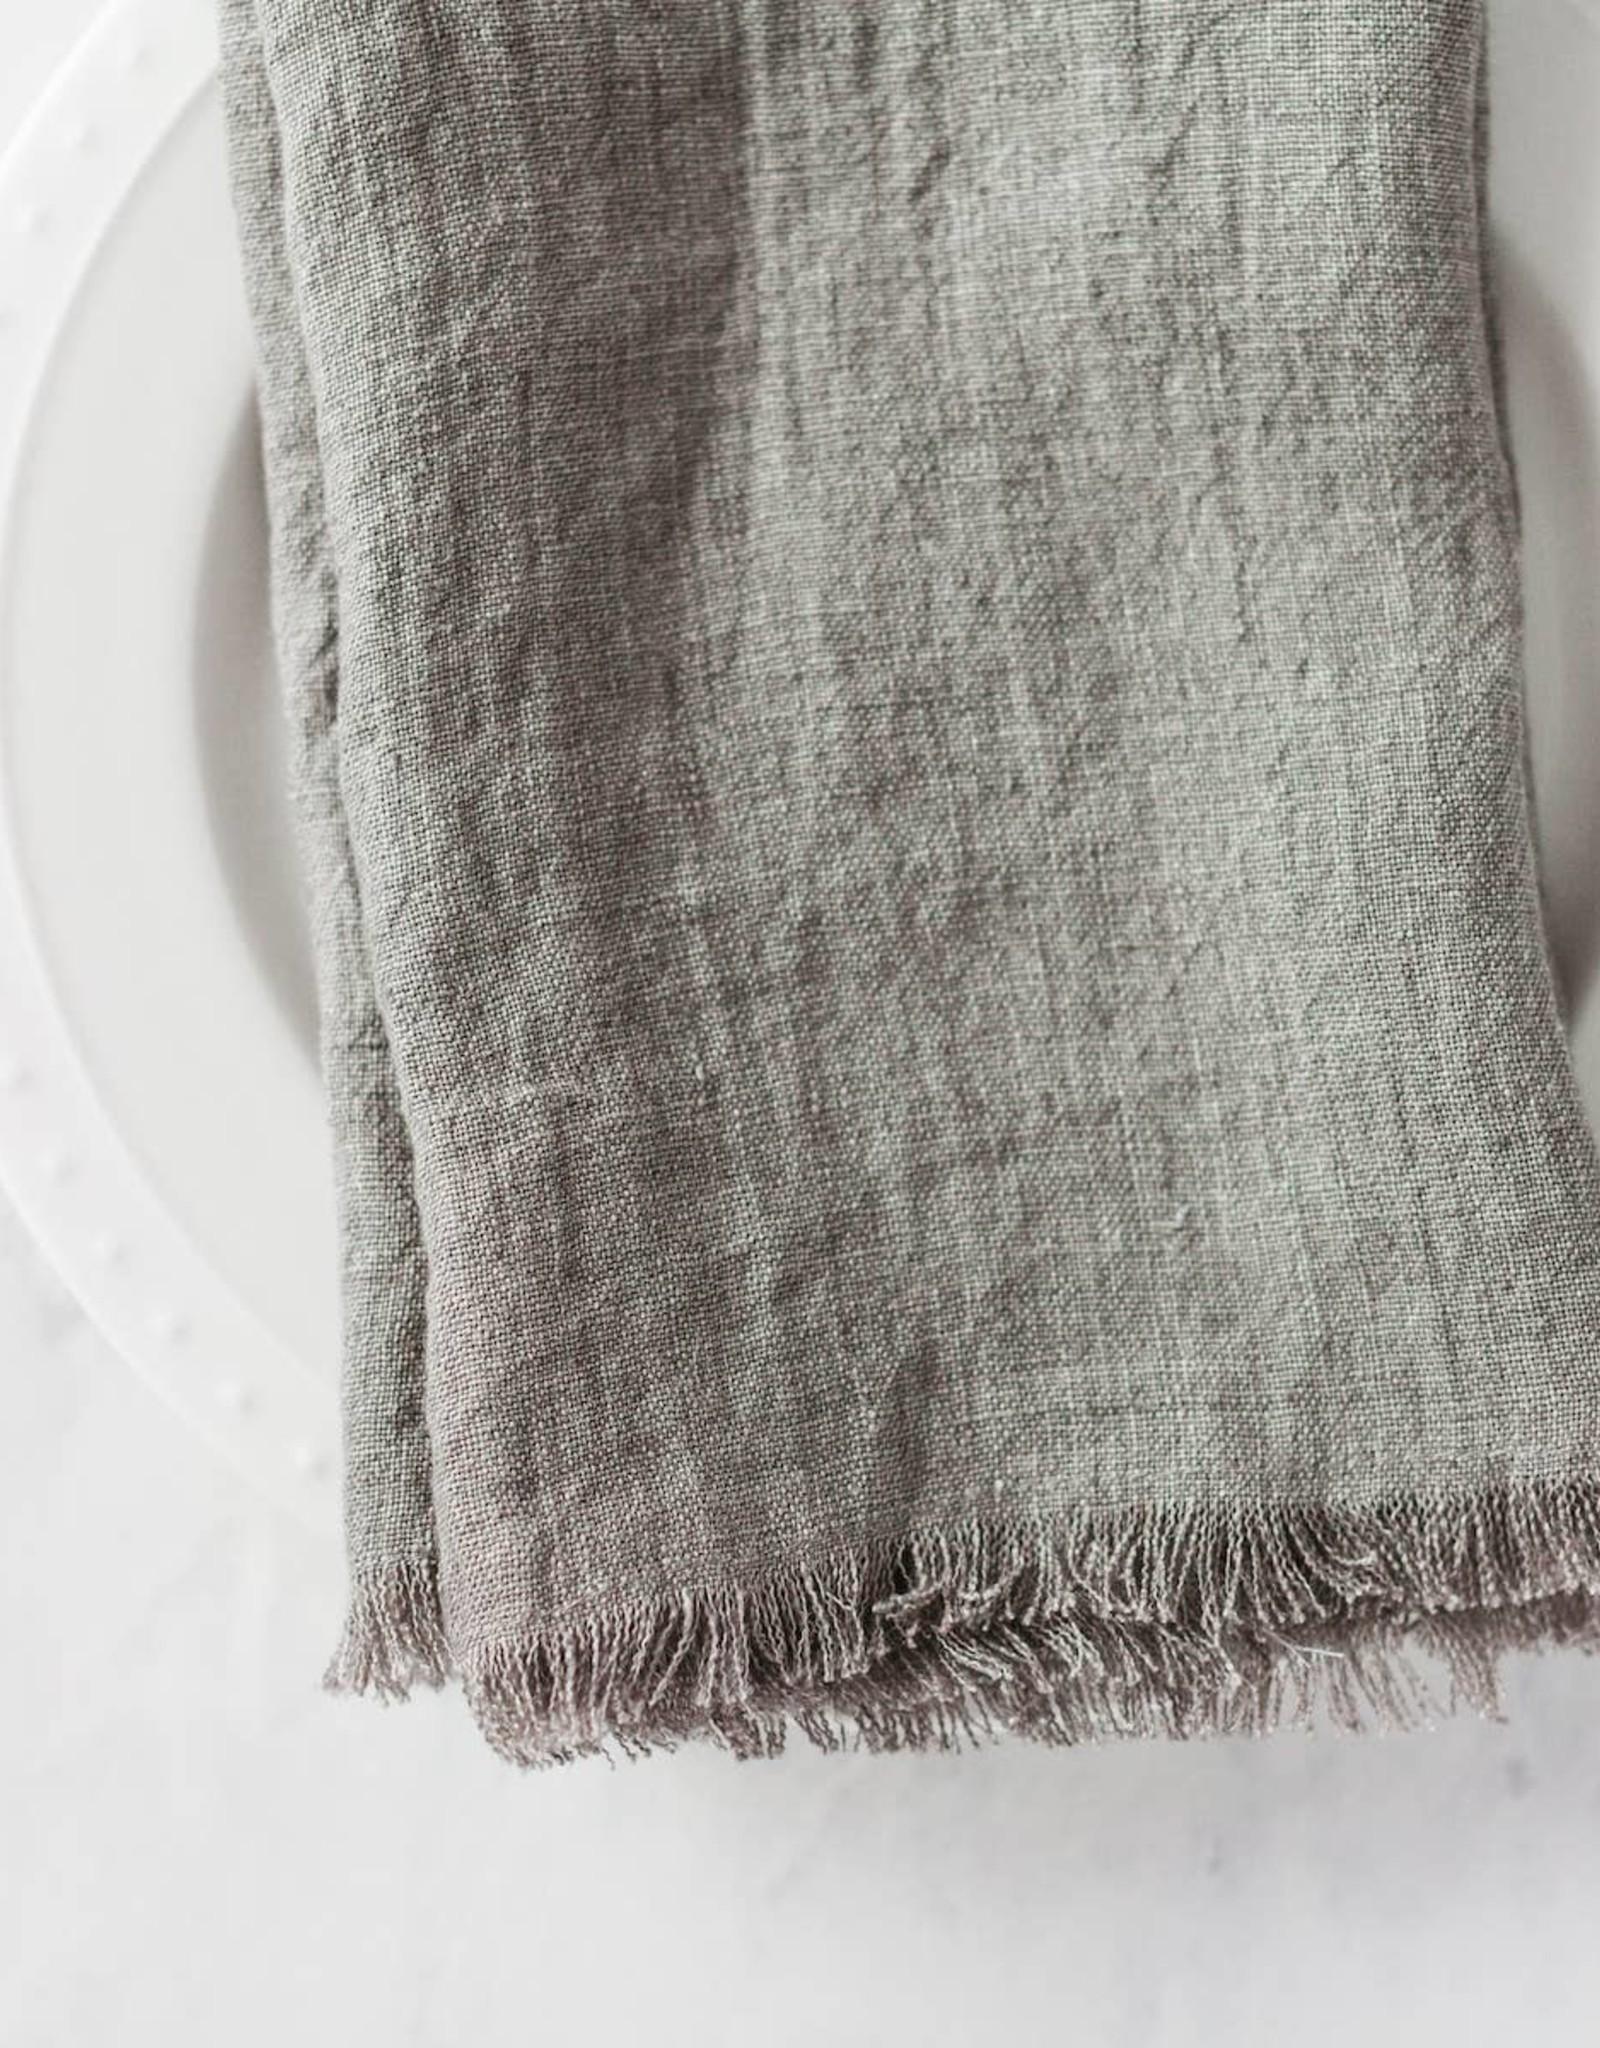 Creative Women Stone Washed Linen Dinner Napkin